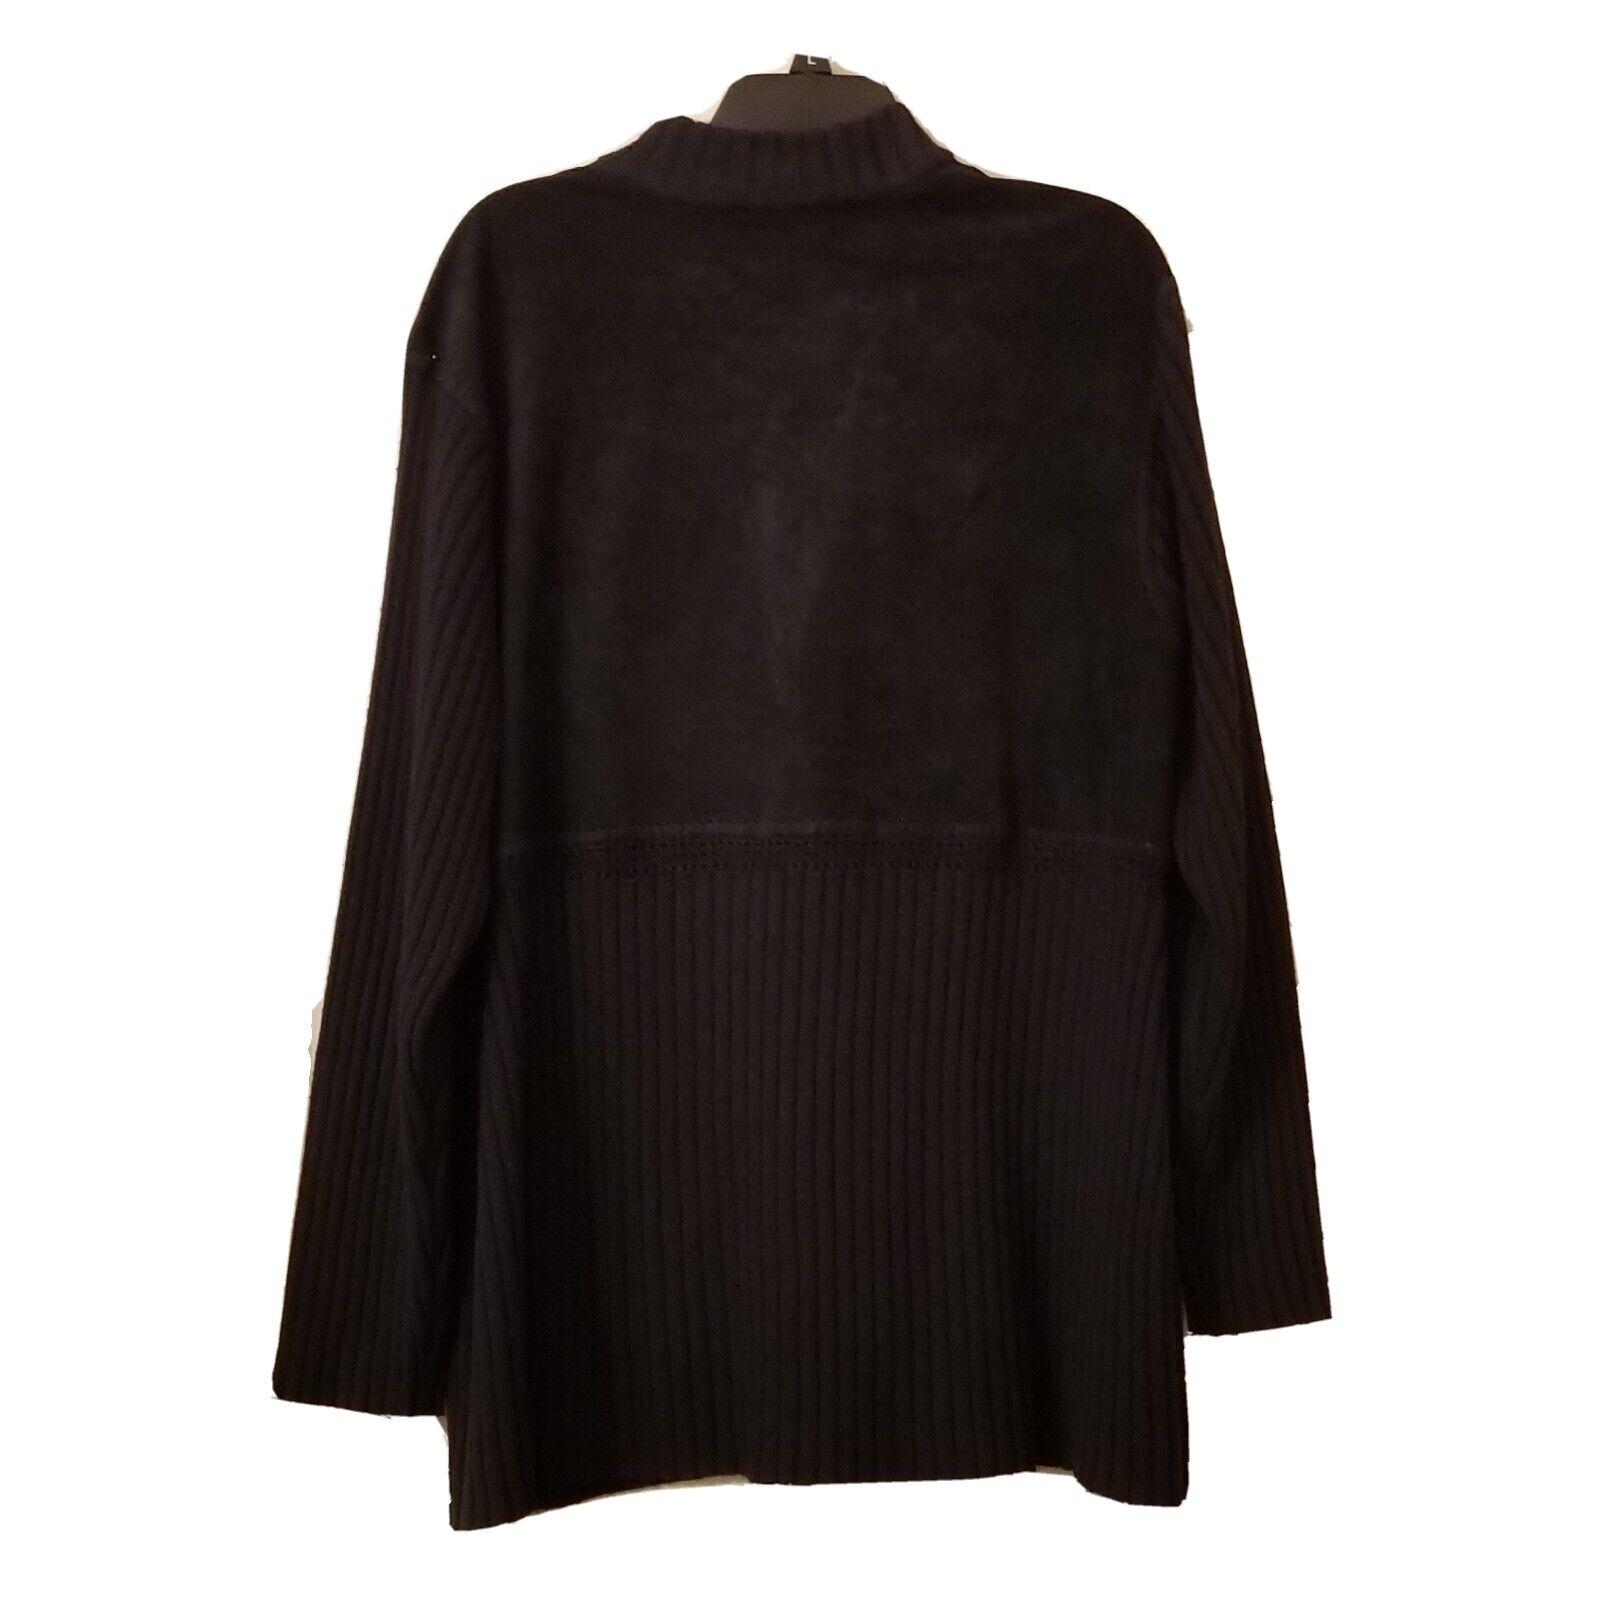 J Jill Cardigan  Wool/suede Leather Blend Woven L… - image 3